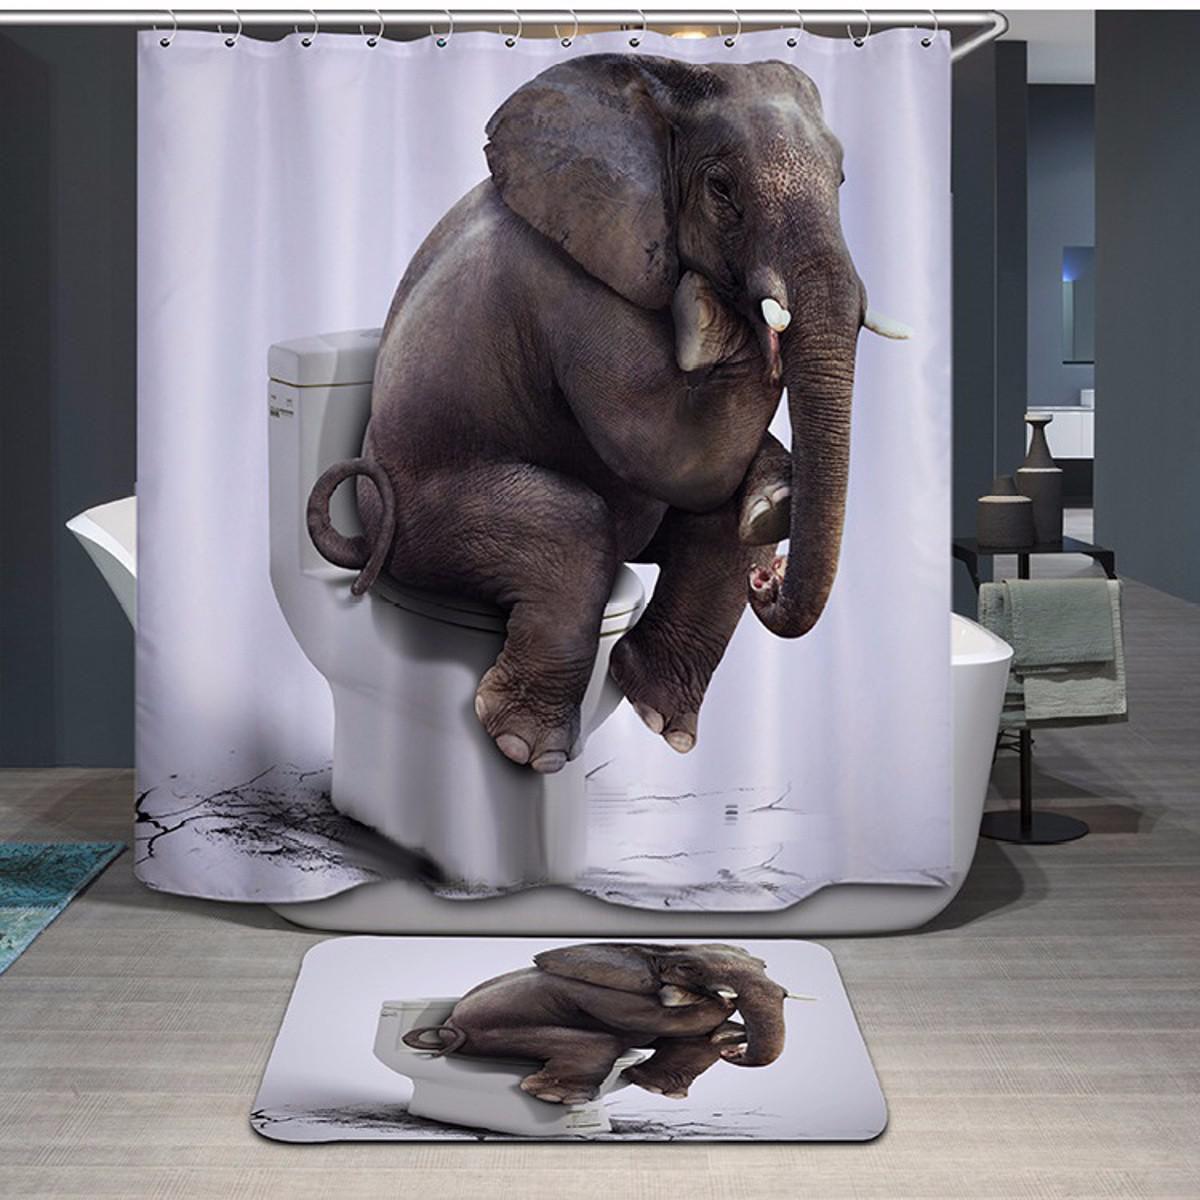 3d Elephant Shower Curtain Waterproof Fabric Bathroom Decor